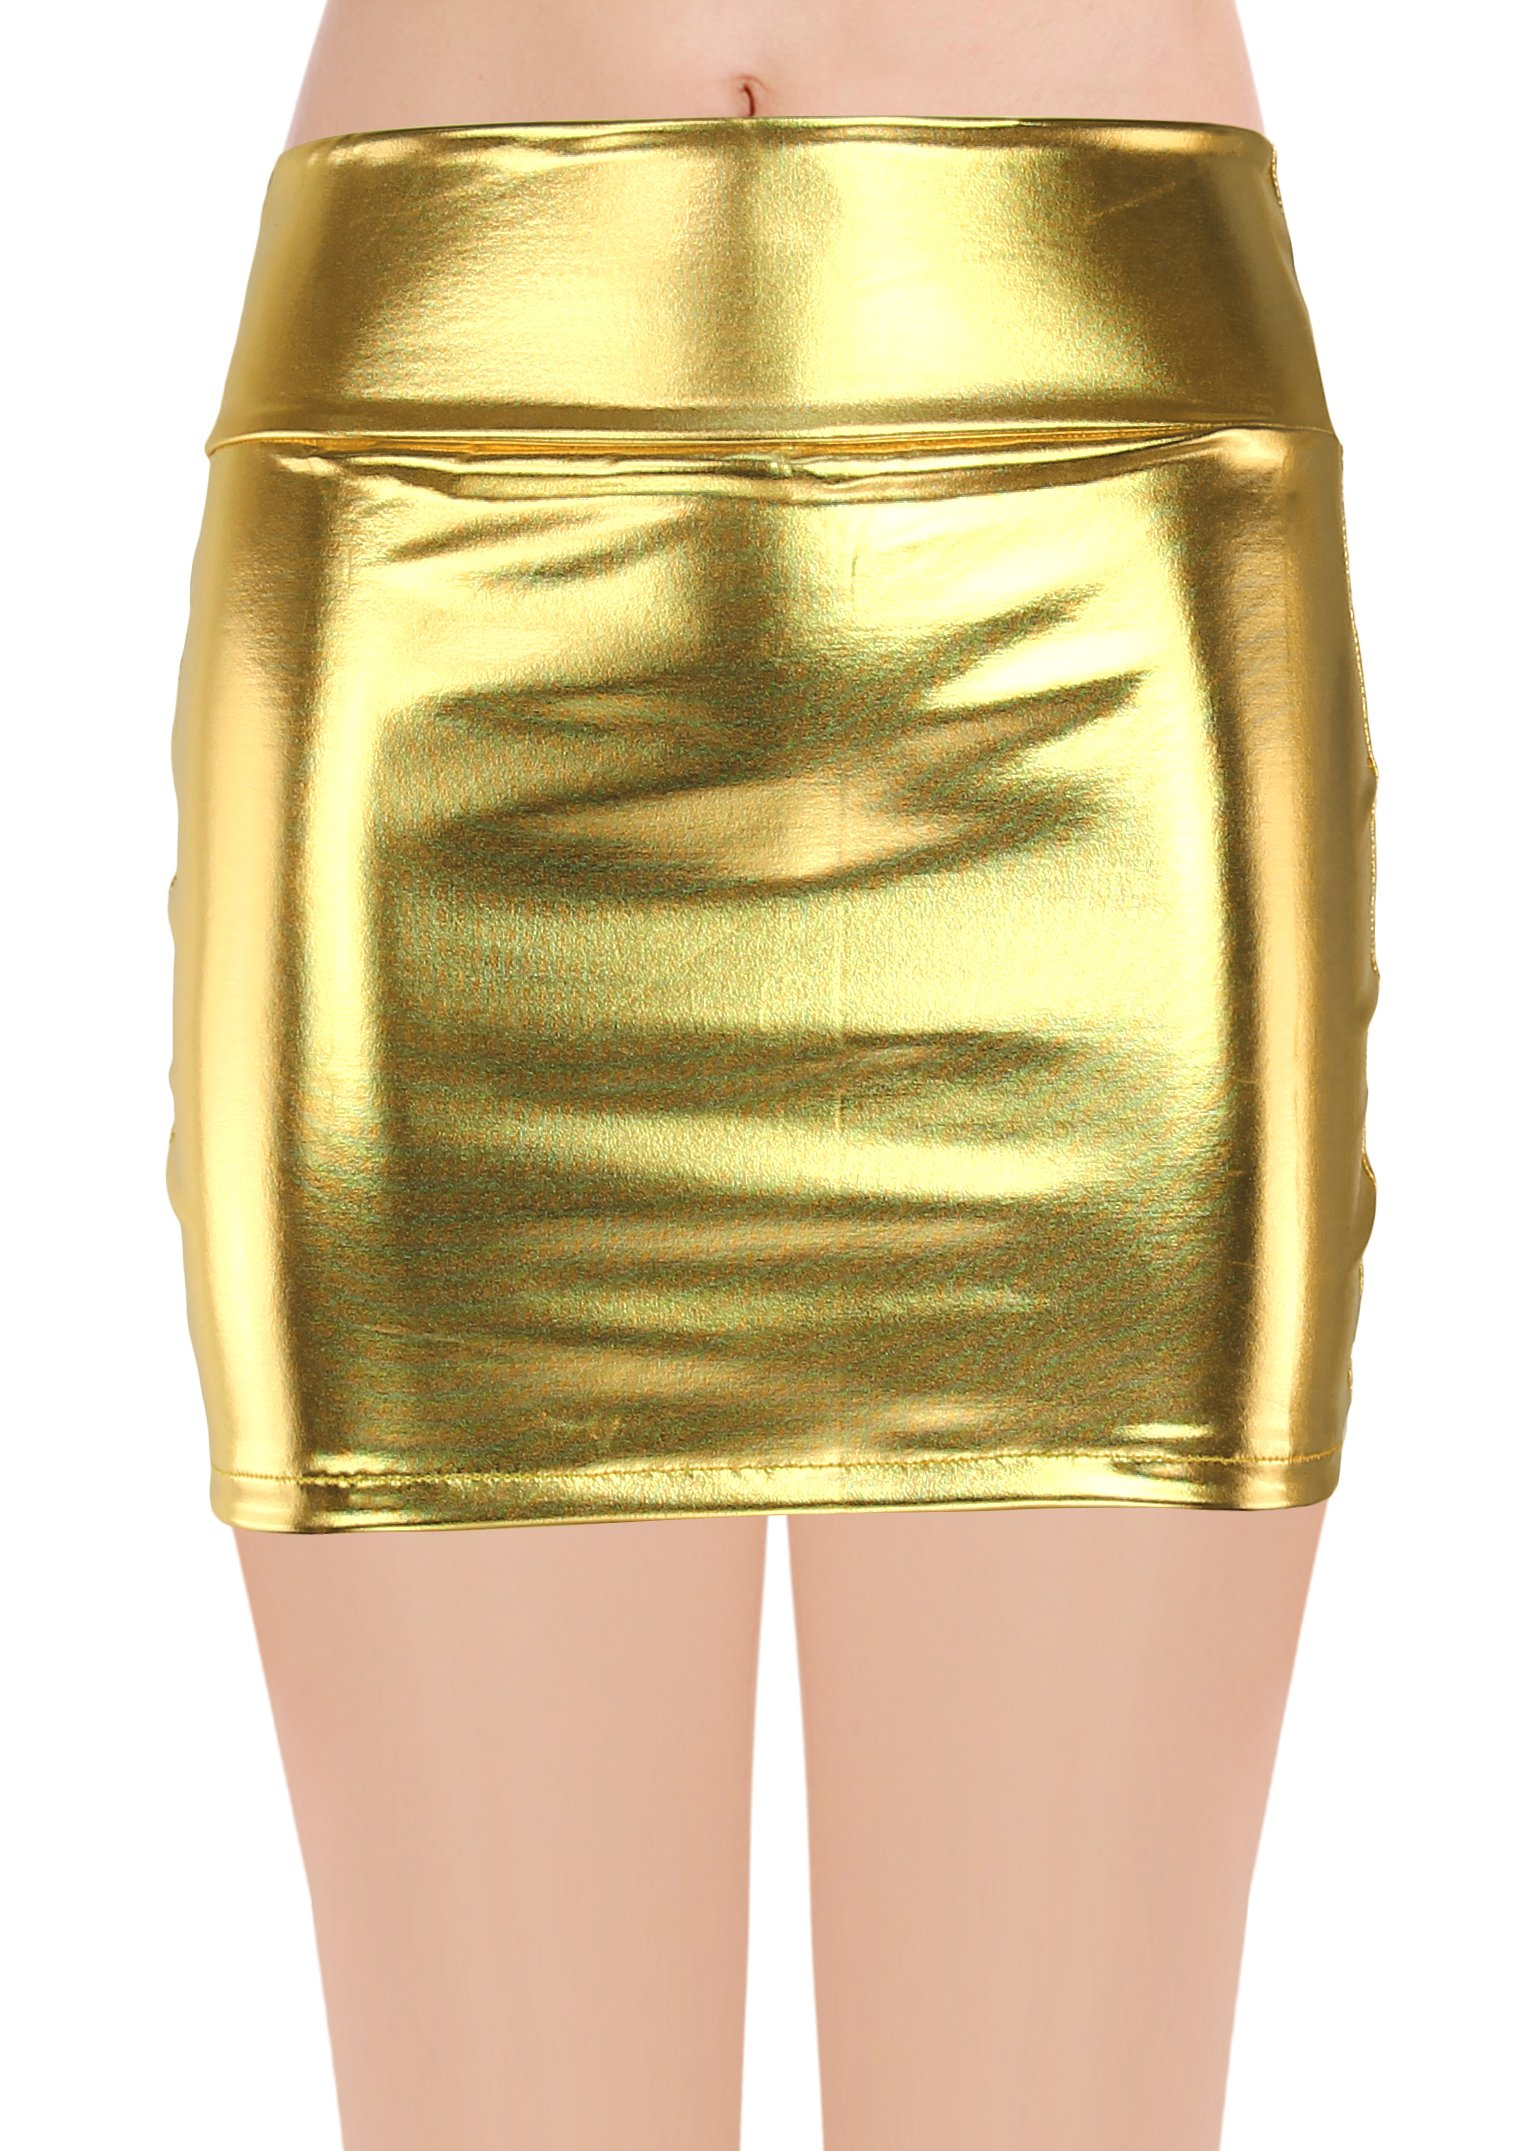 JustinCostume Women's Shiny Metallic Liquid Short Mini Skirt (M, Gold)